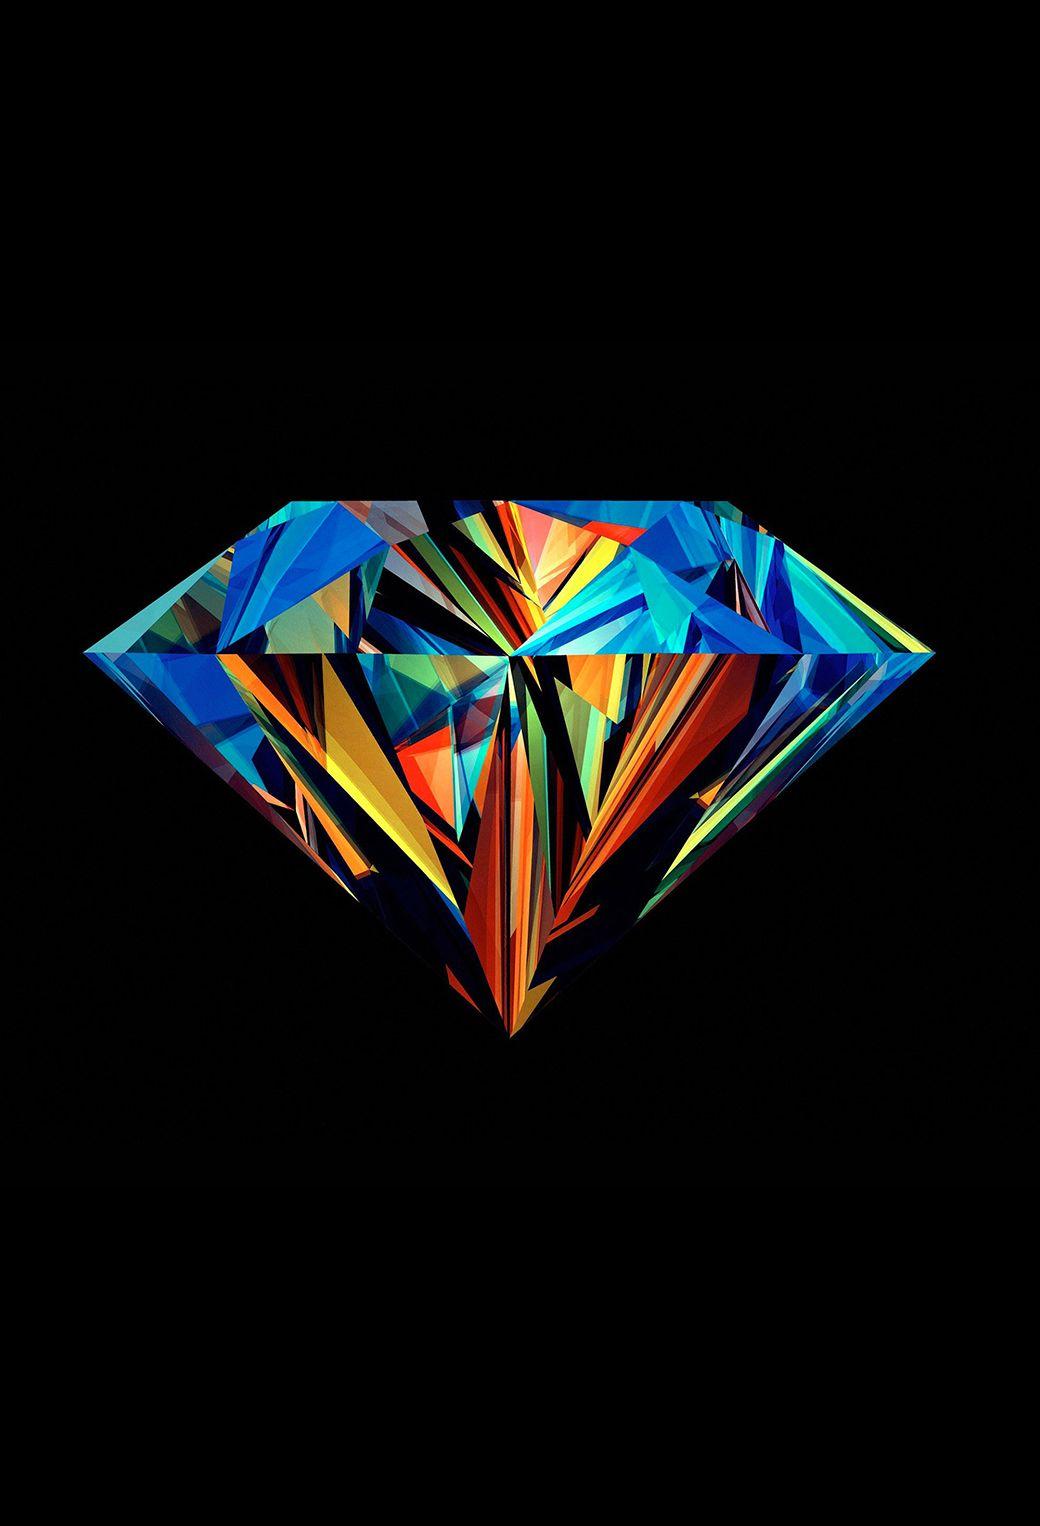 Colorful polygon in the diamond HD wallpaper